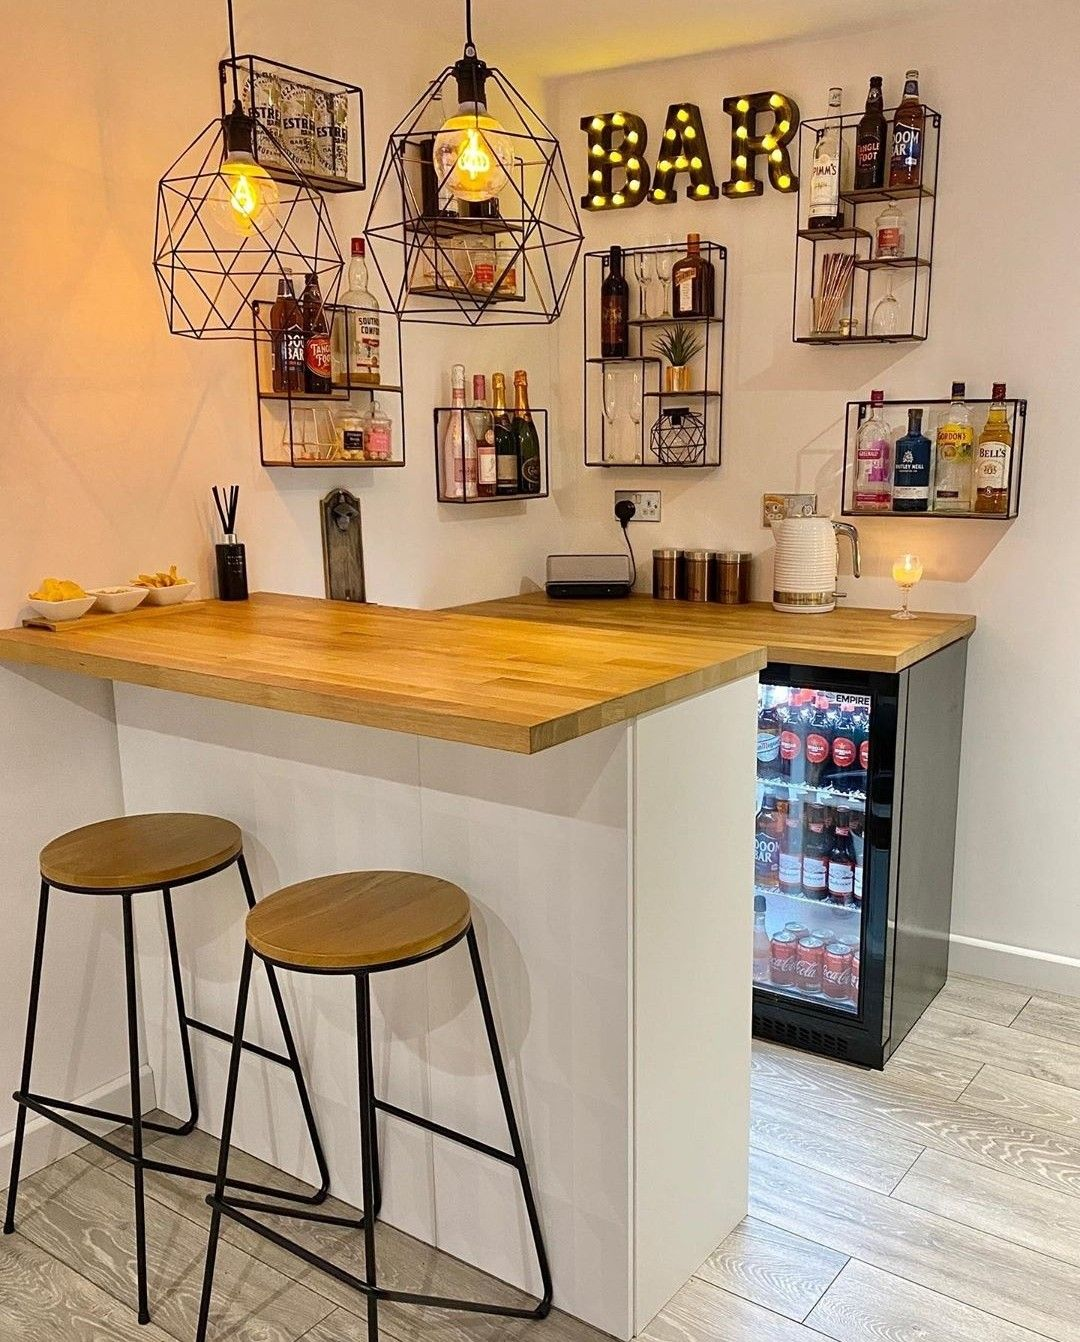 ❤ THE BEST HOME BAR IDEAS FOUND ON INSTAGRAM | Home bar rooms, Home bar  counter, Home bar areas